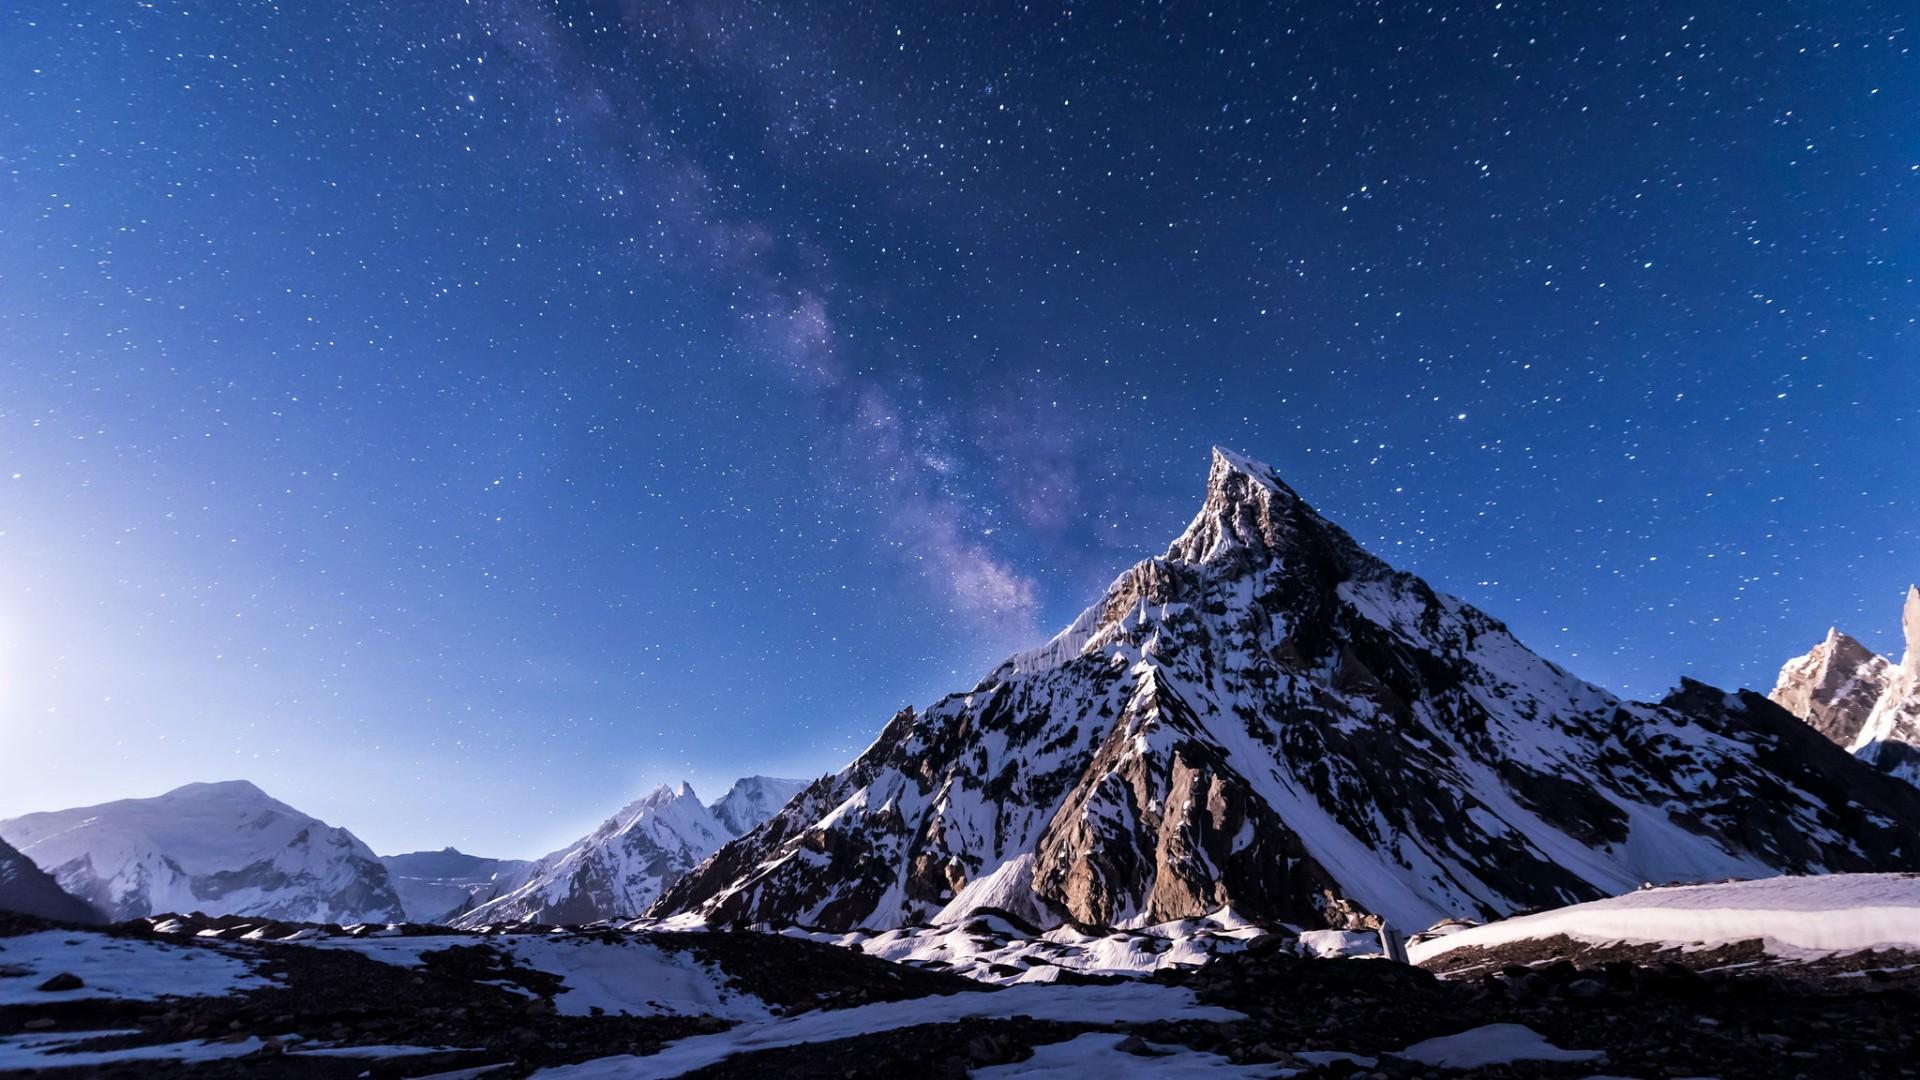 Mitre peak in Karakorum Mountains wallpaper